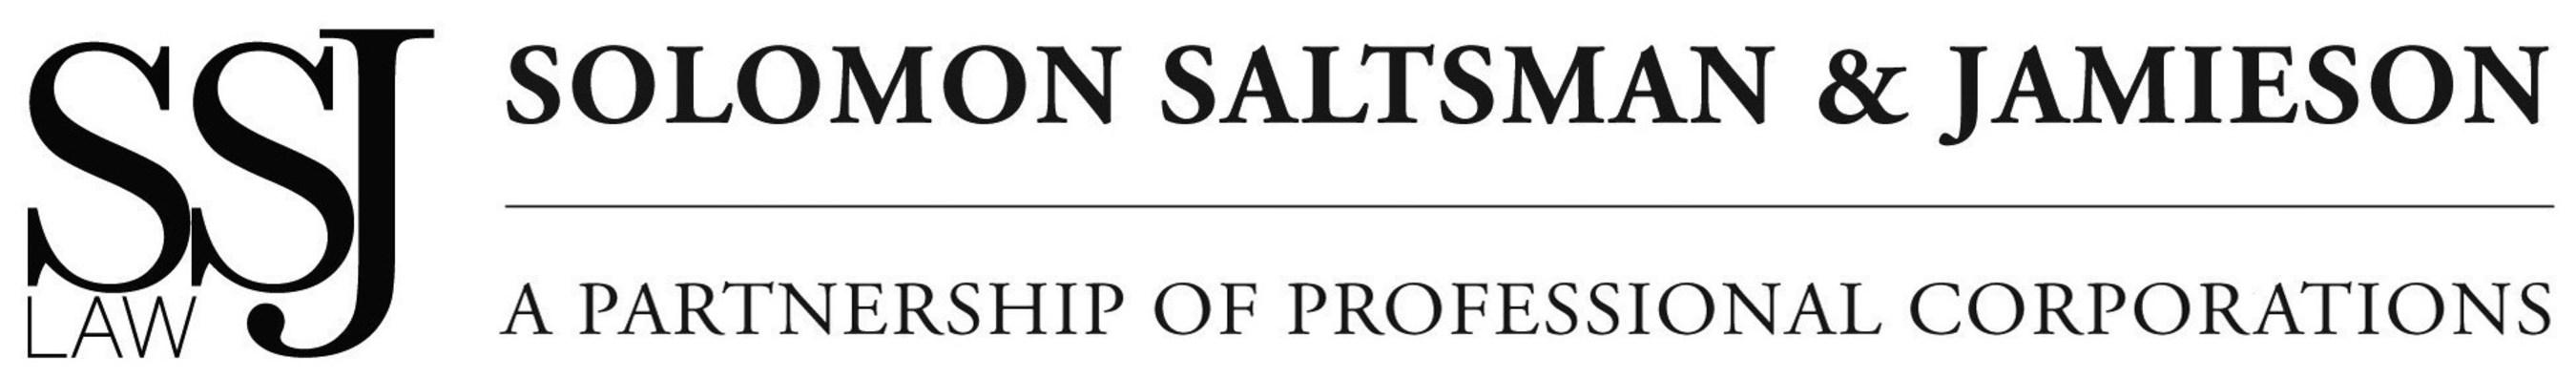 SSJ Law - Solomon Saltsman & Jamieson Logo